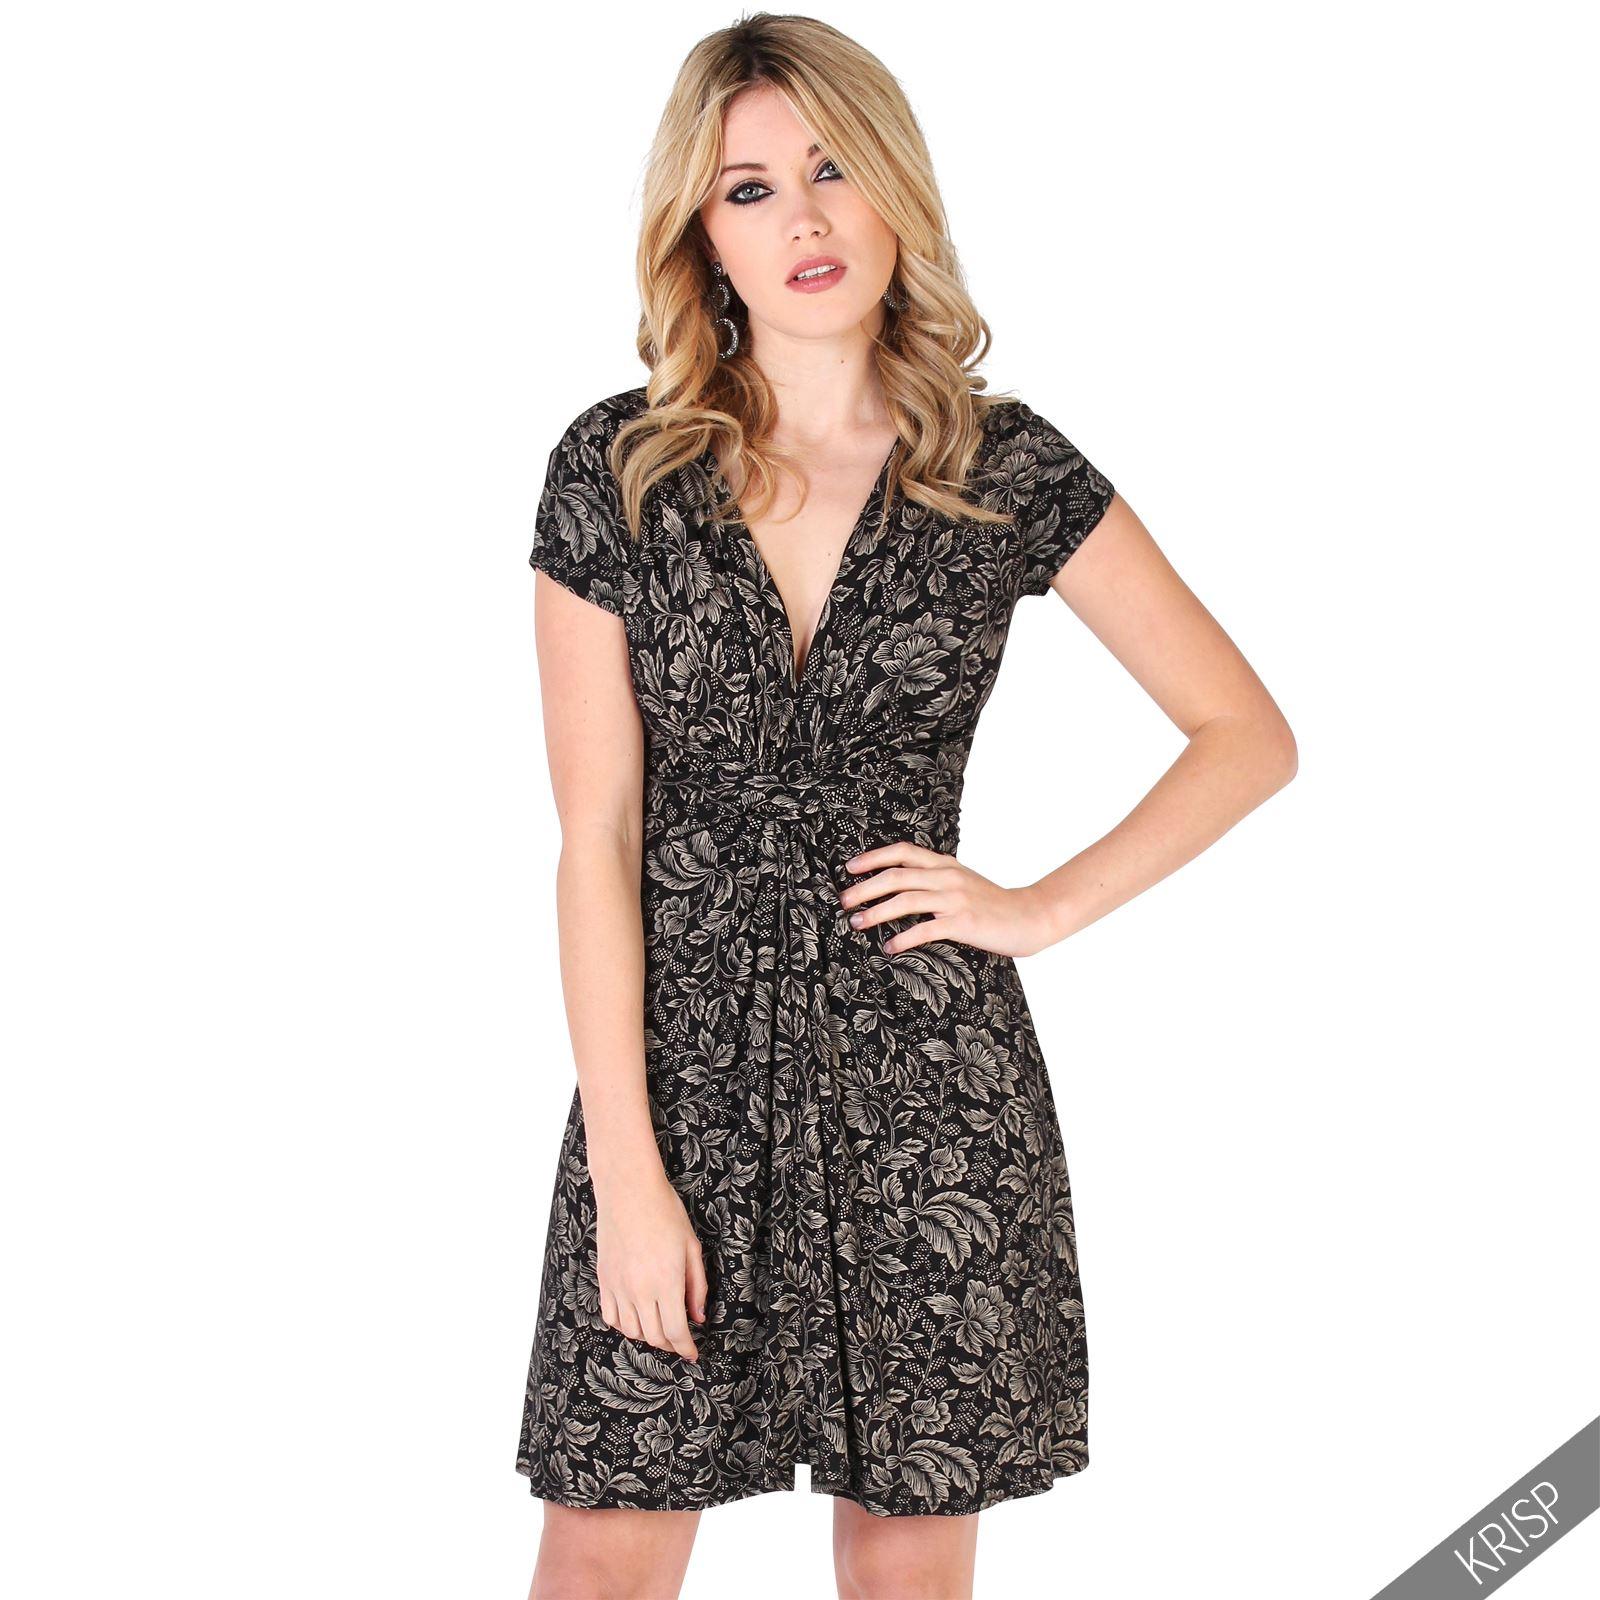 damen kleid mini vorn geknotet blumen muster wickelkleid v ausschnitt ebay. Black Bedroom Furniture Sets. Home Design Ideas